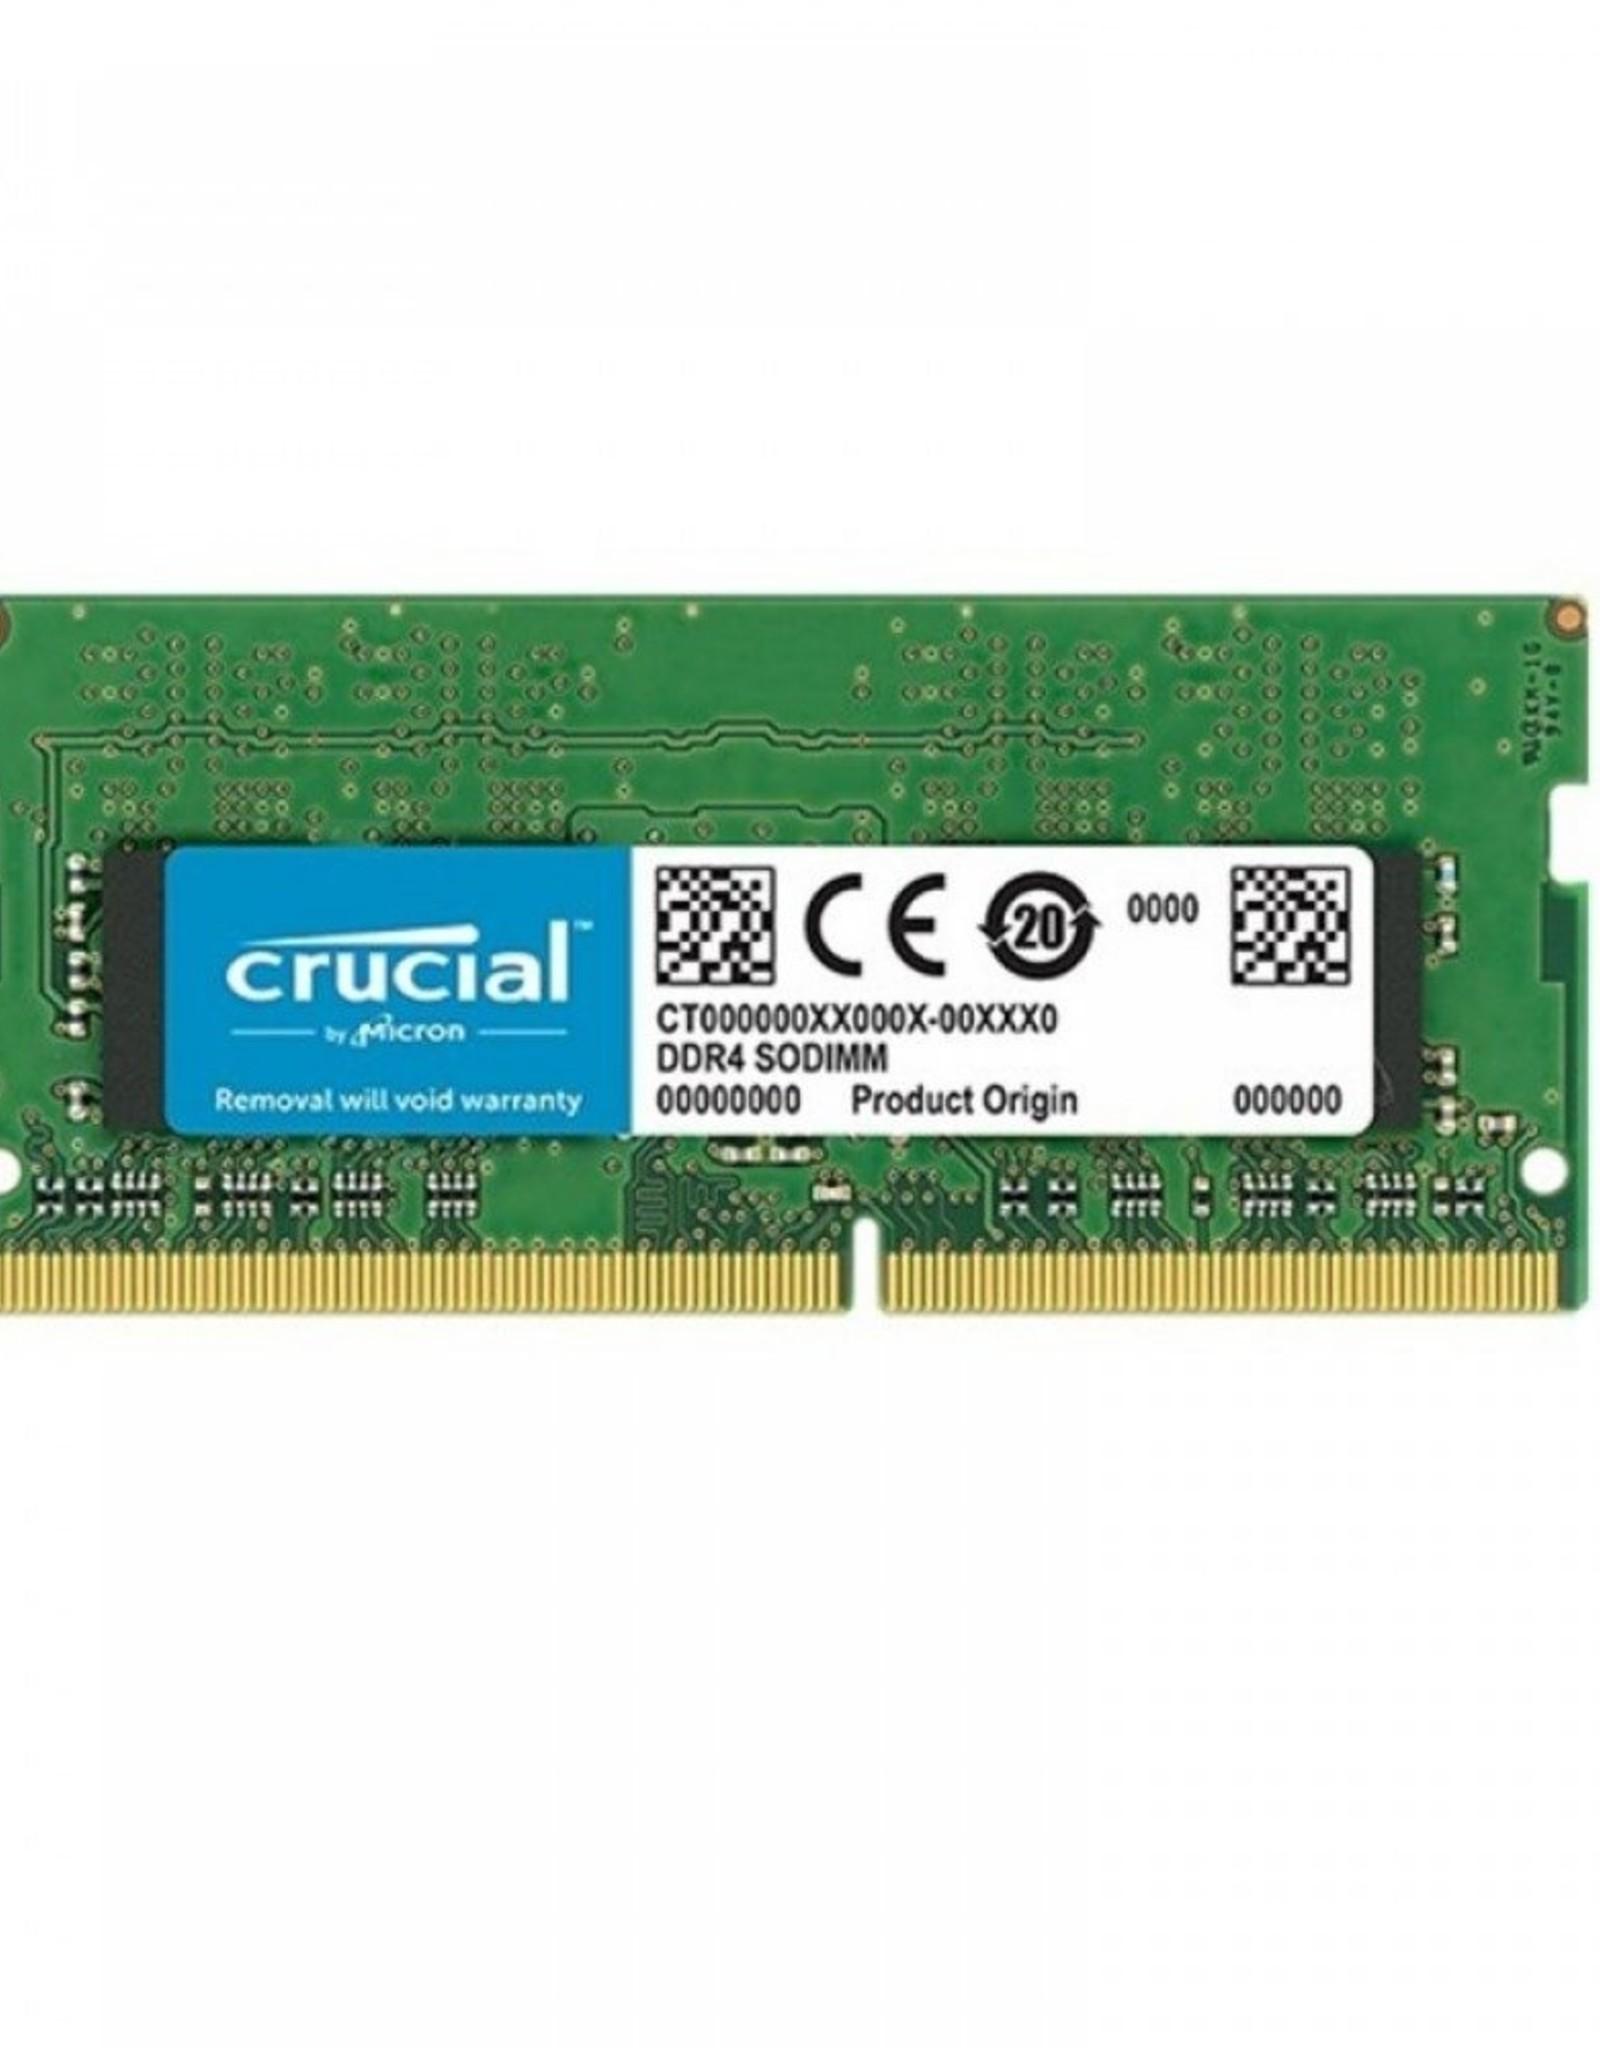 MEM  8GB DDR4 / 2400 SODIMM